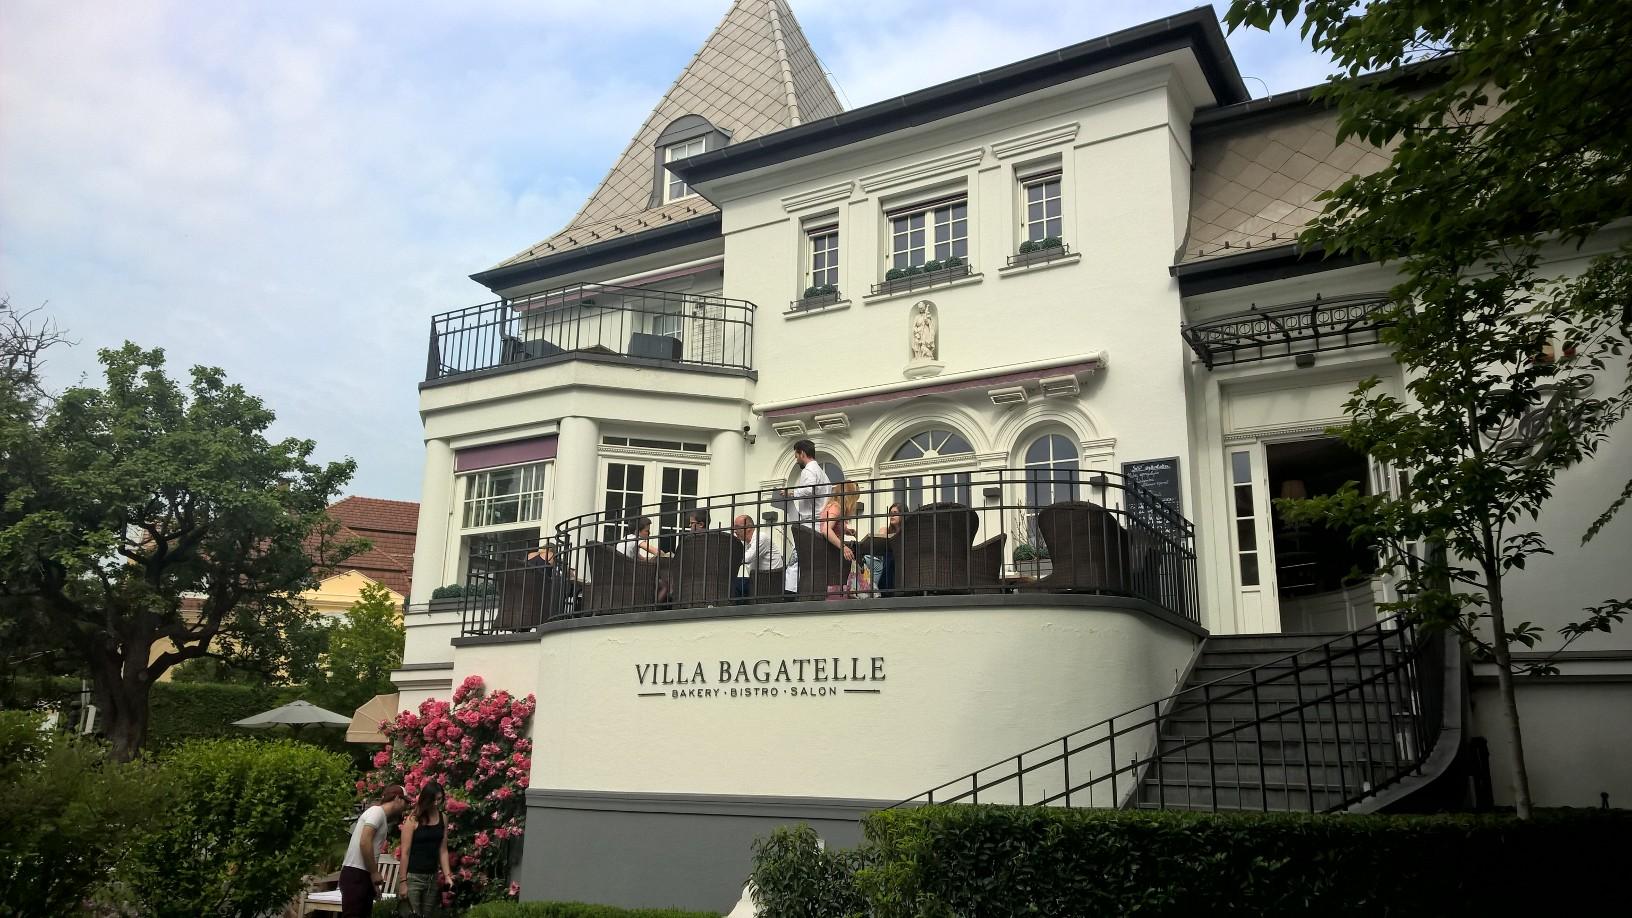 Reggelizz a Villa Bagatelle-ben!